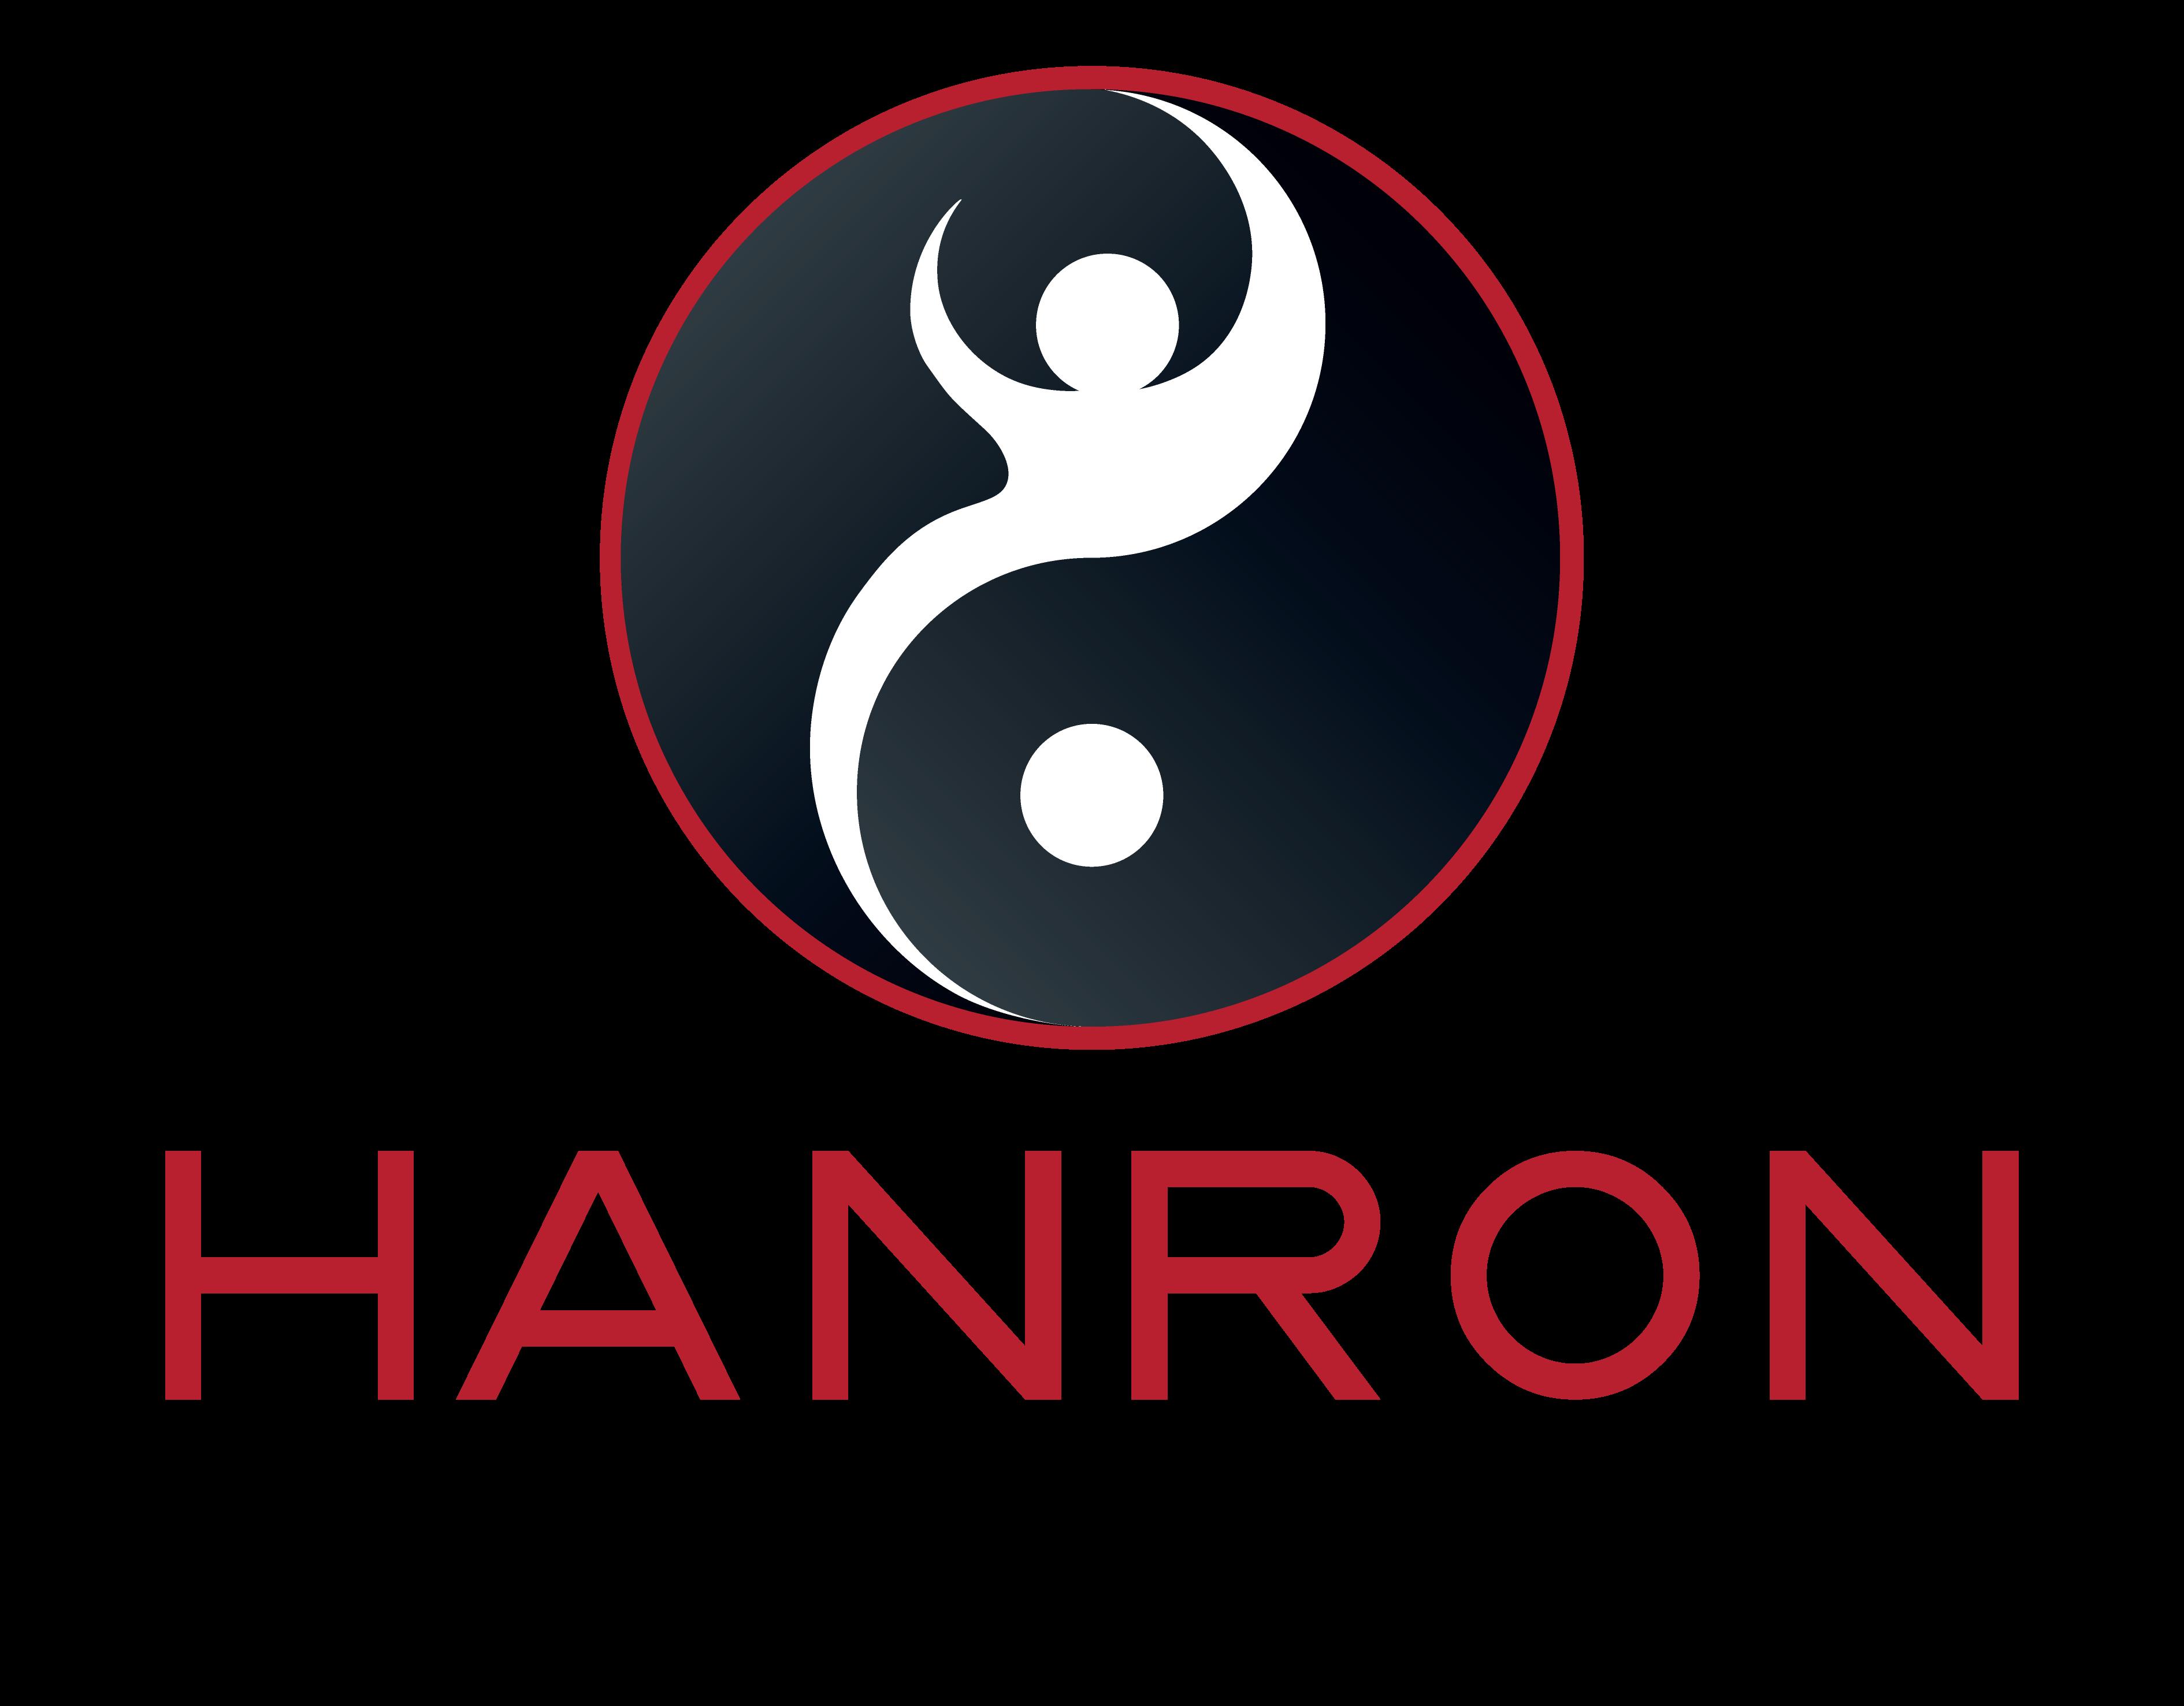 Hanron Health and Success